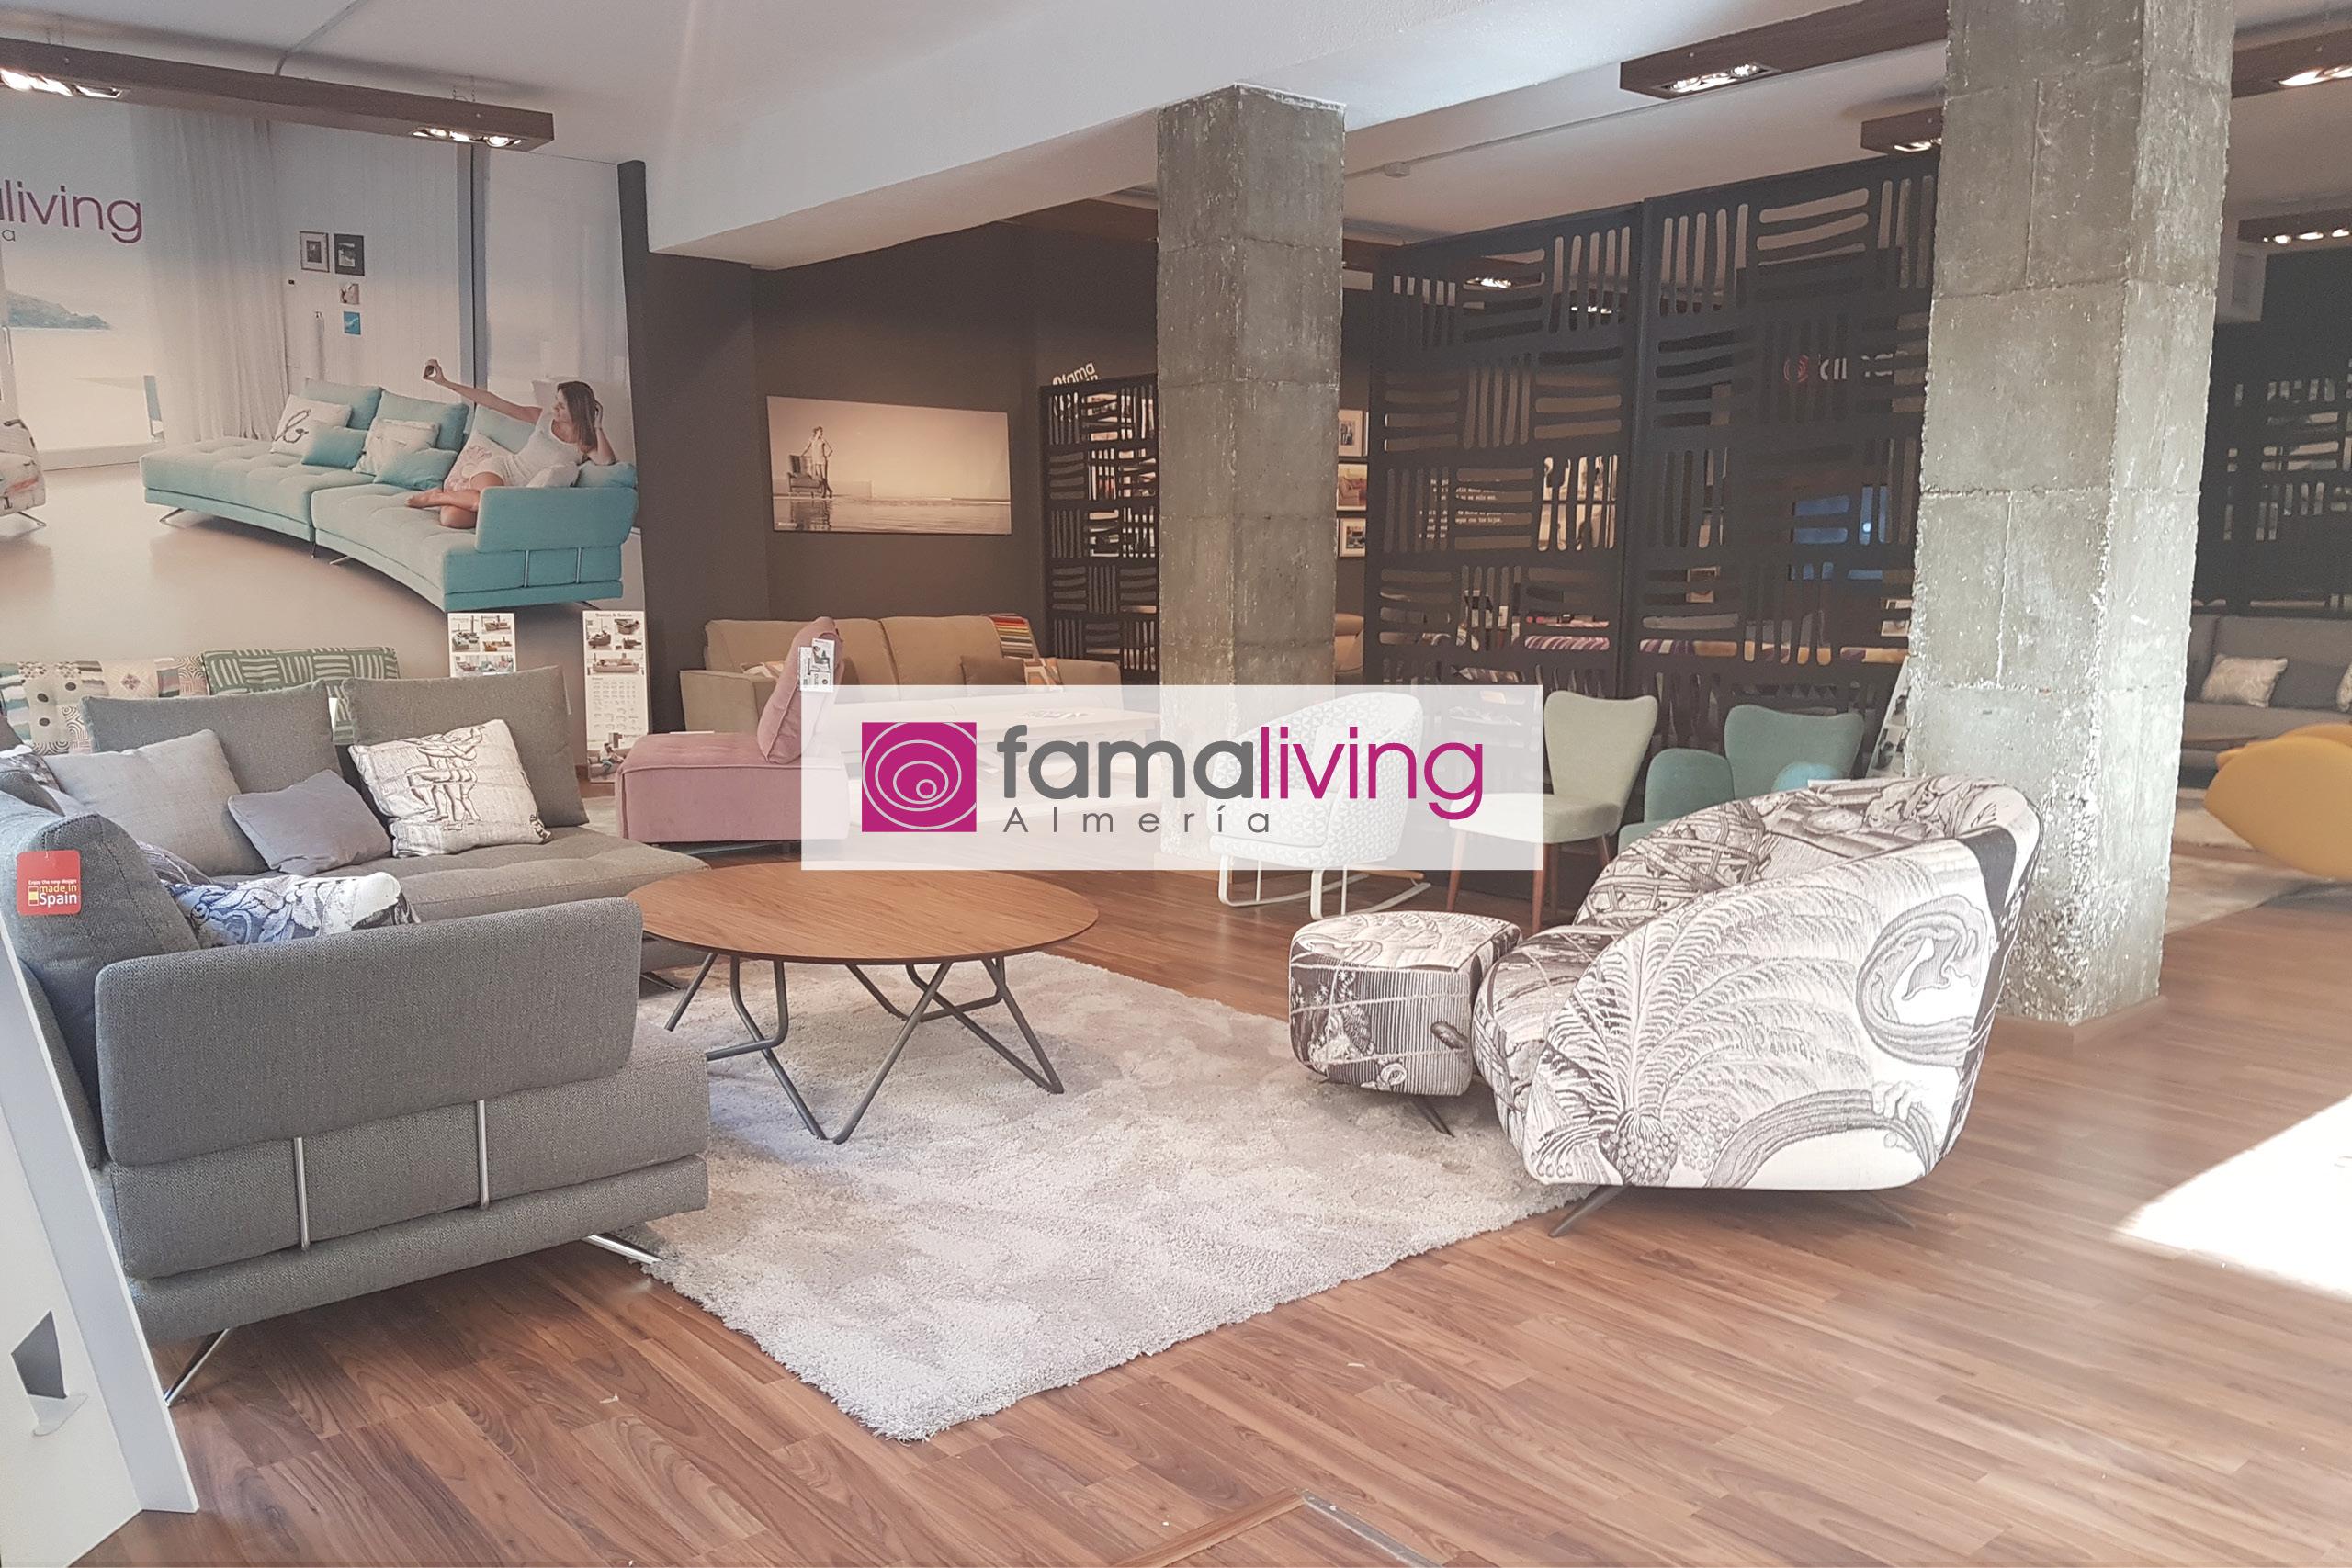 https://www.famaliving.com/almeria-fr